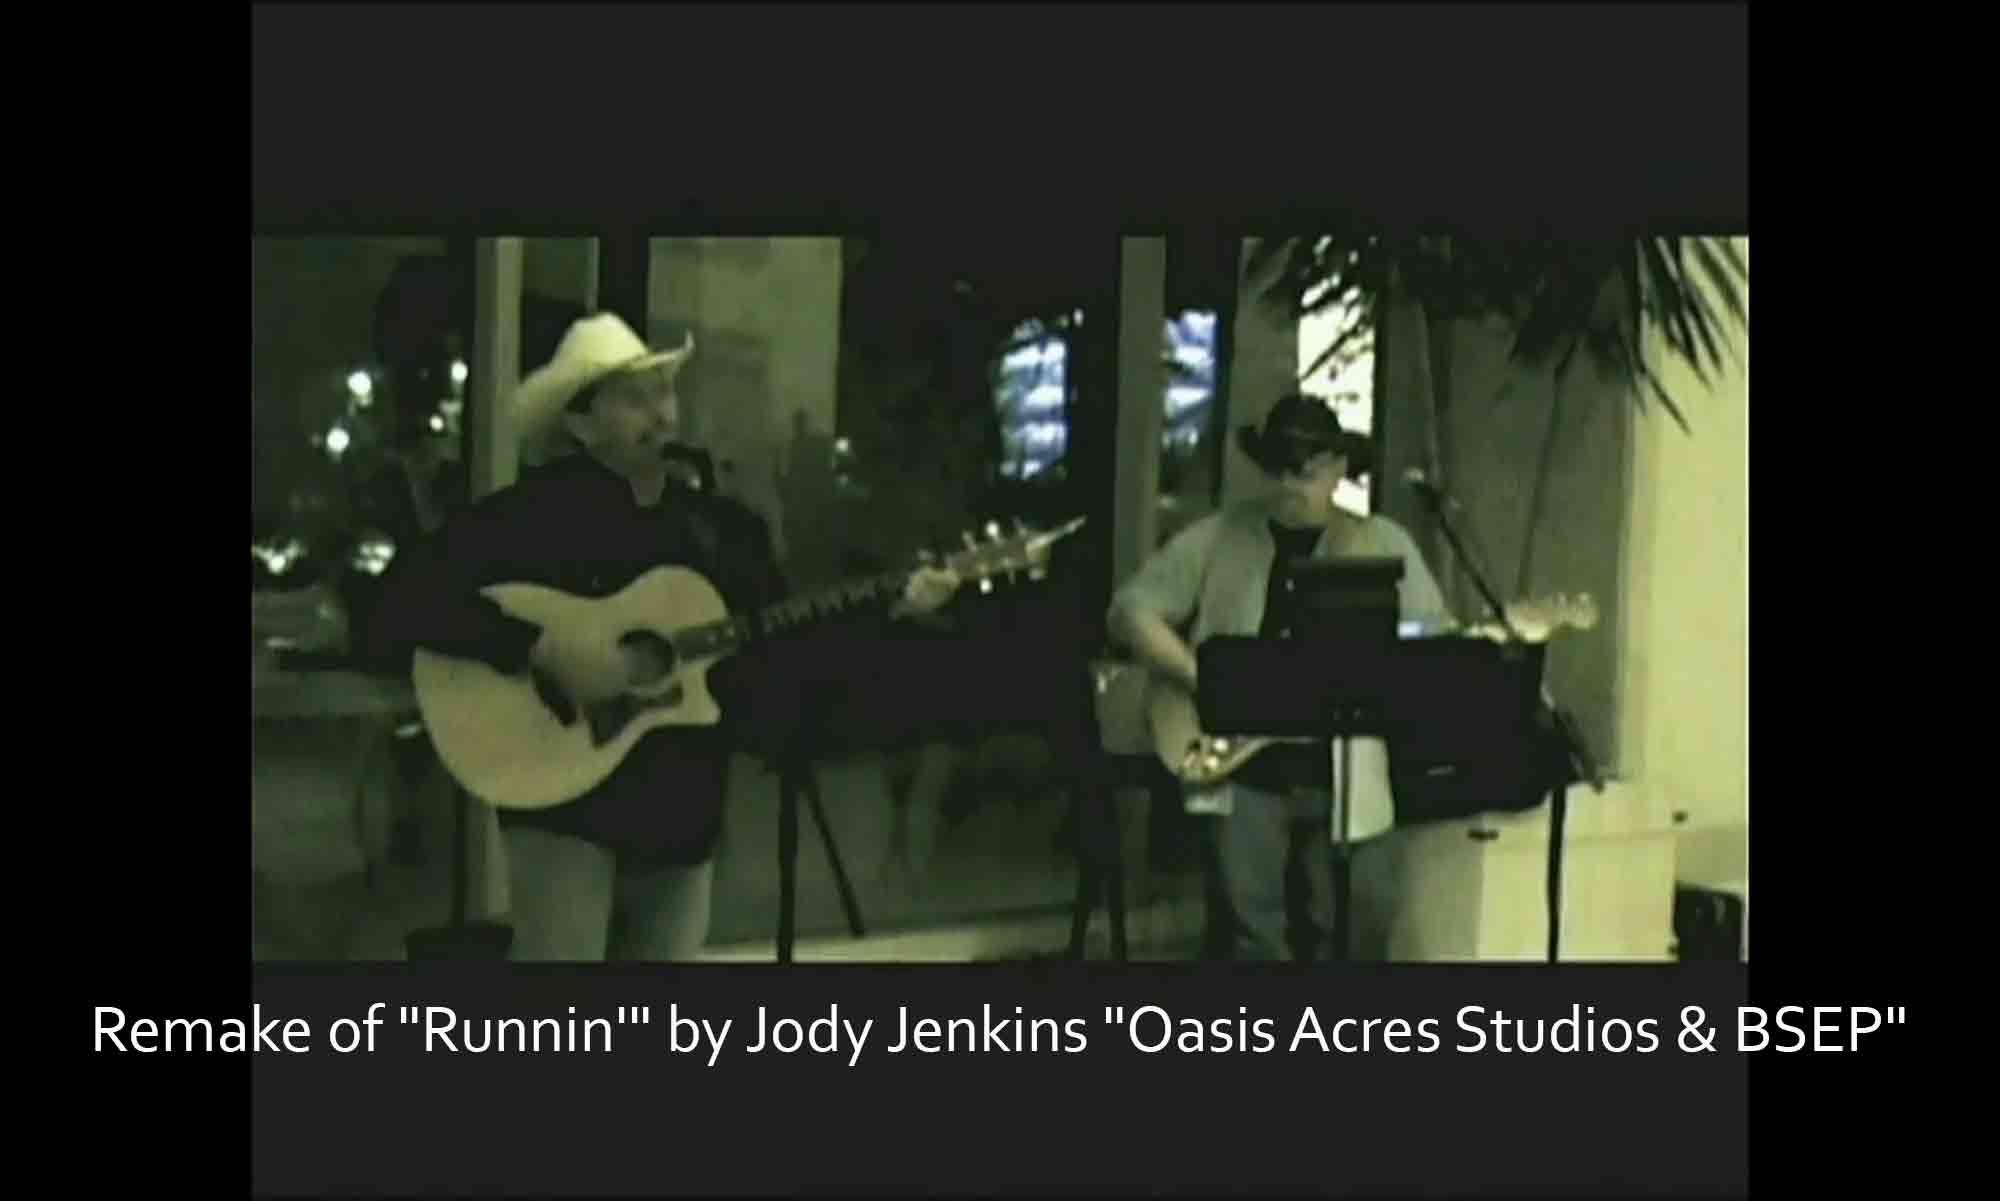 Image of Remake of Runnin by Jody Jenkins Oasis Acres Studios & BSEP Brayton Scott Entertainment©